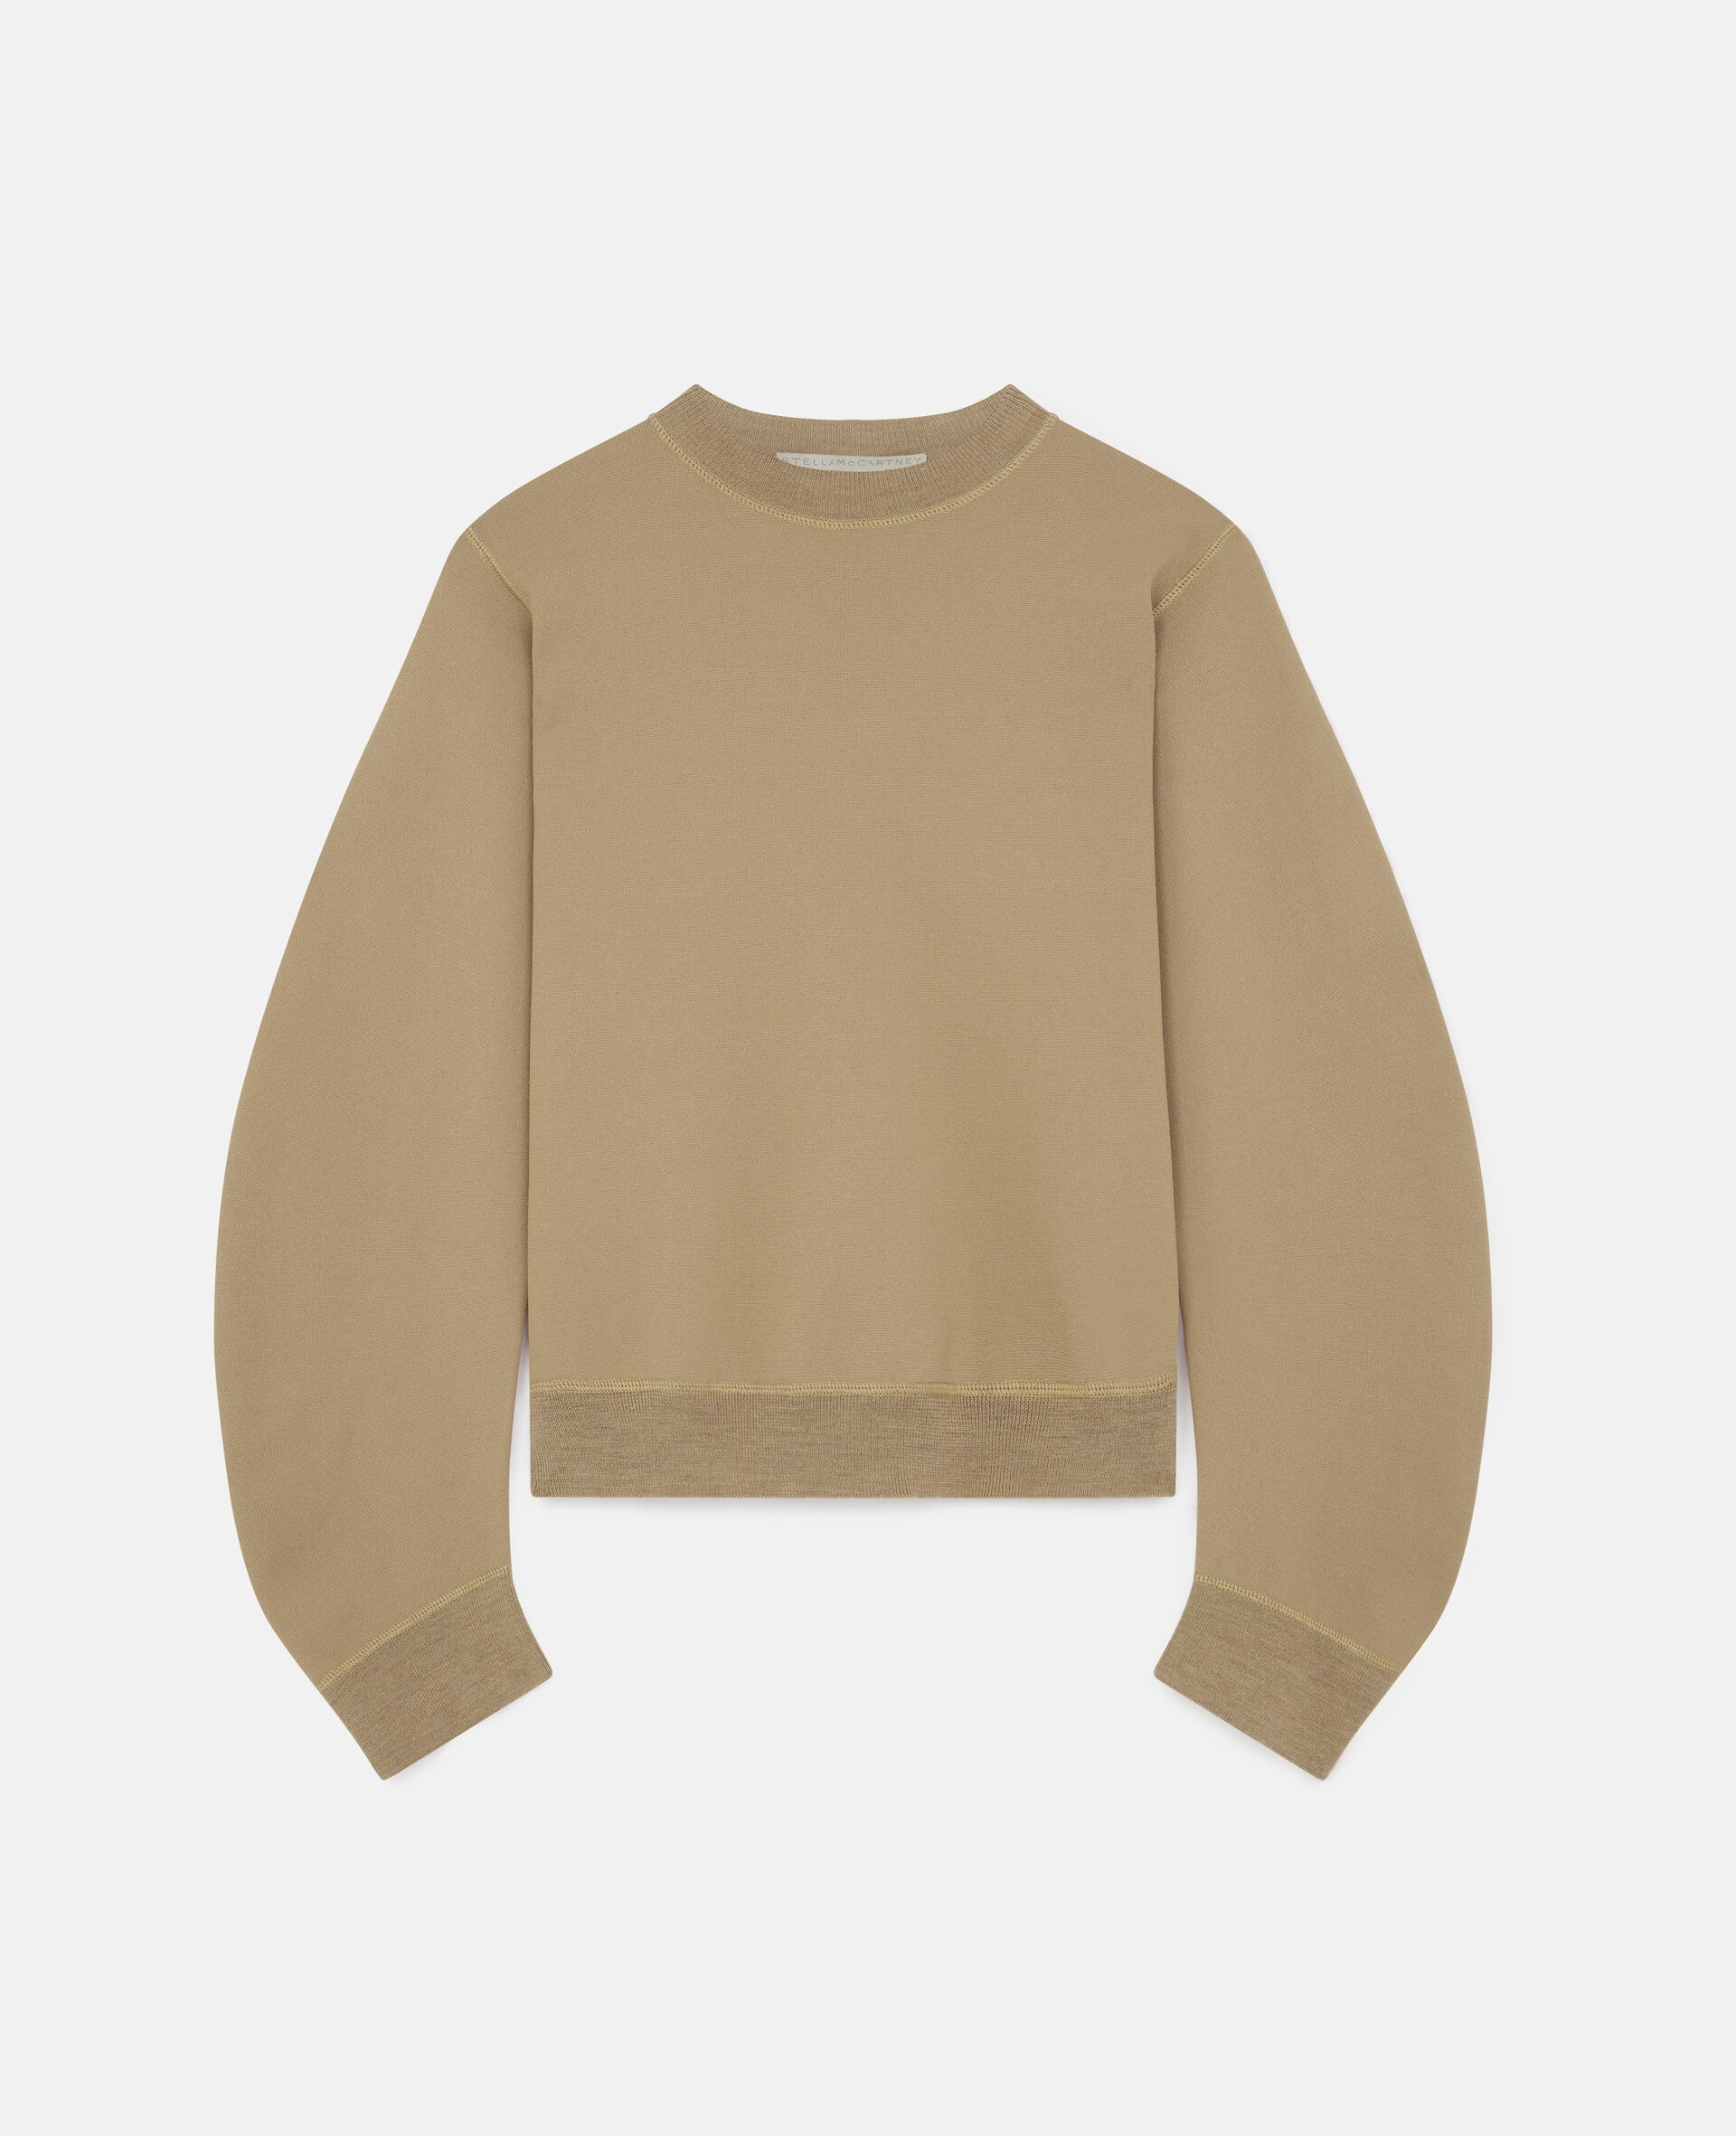 Pullover aus engmaschigem Strick-Brown-large image number 0